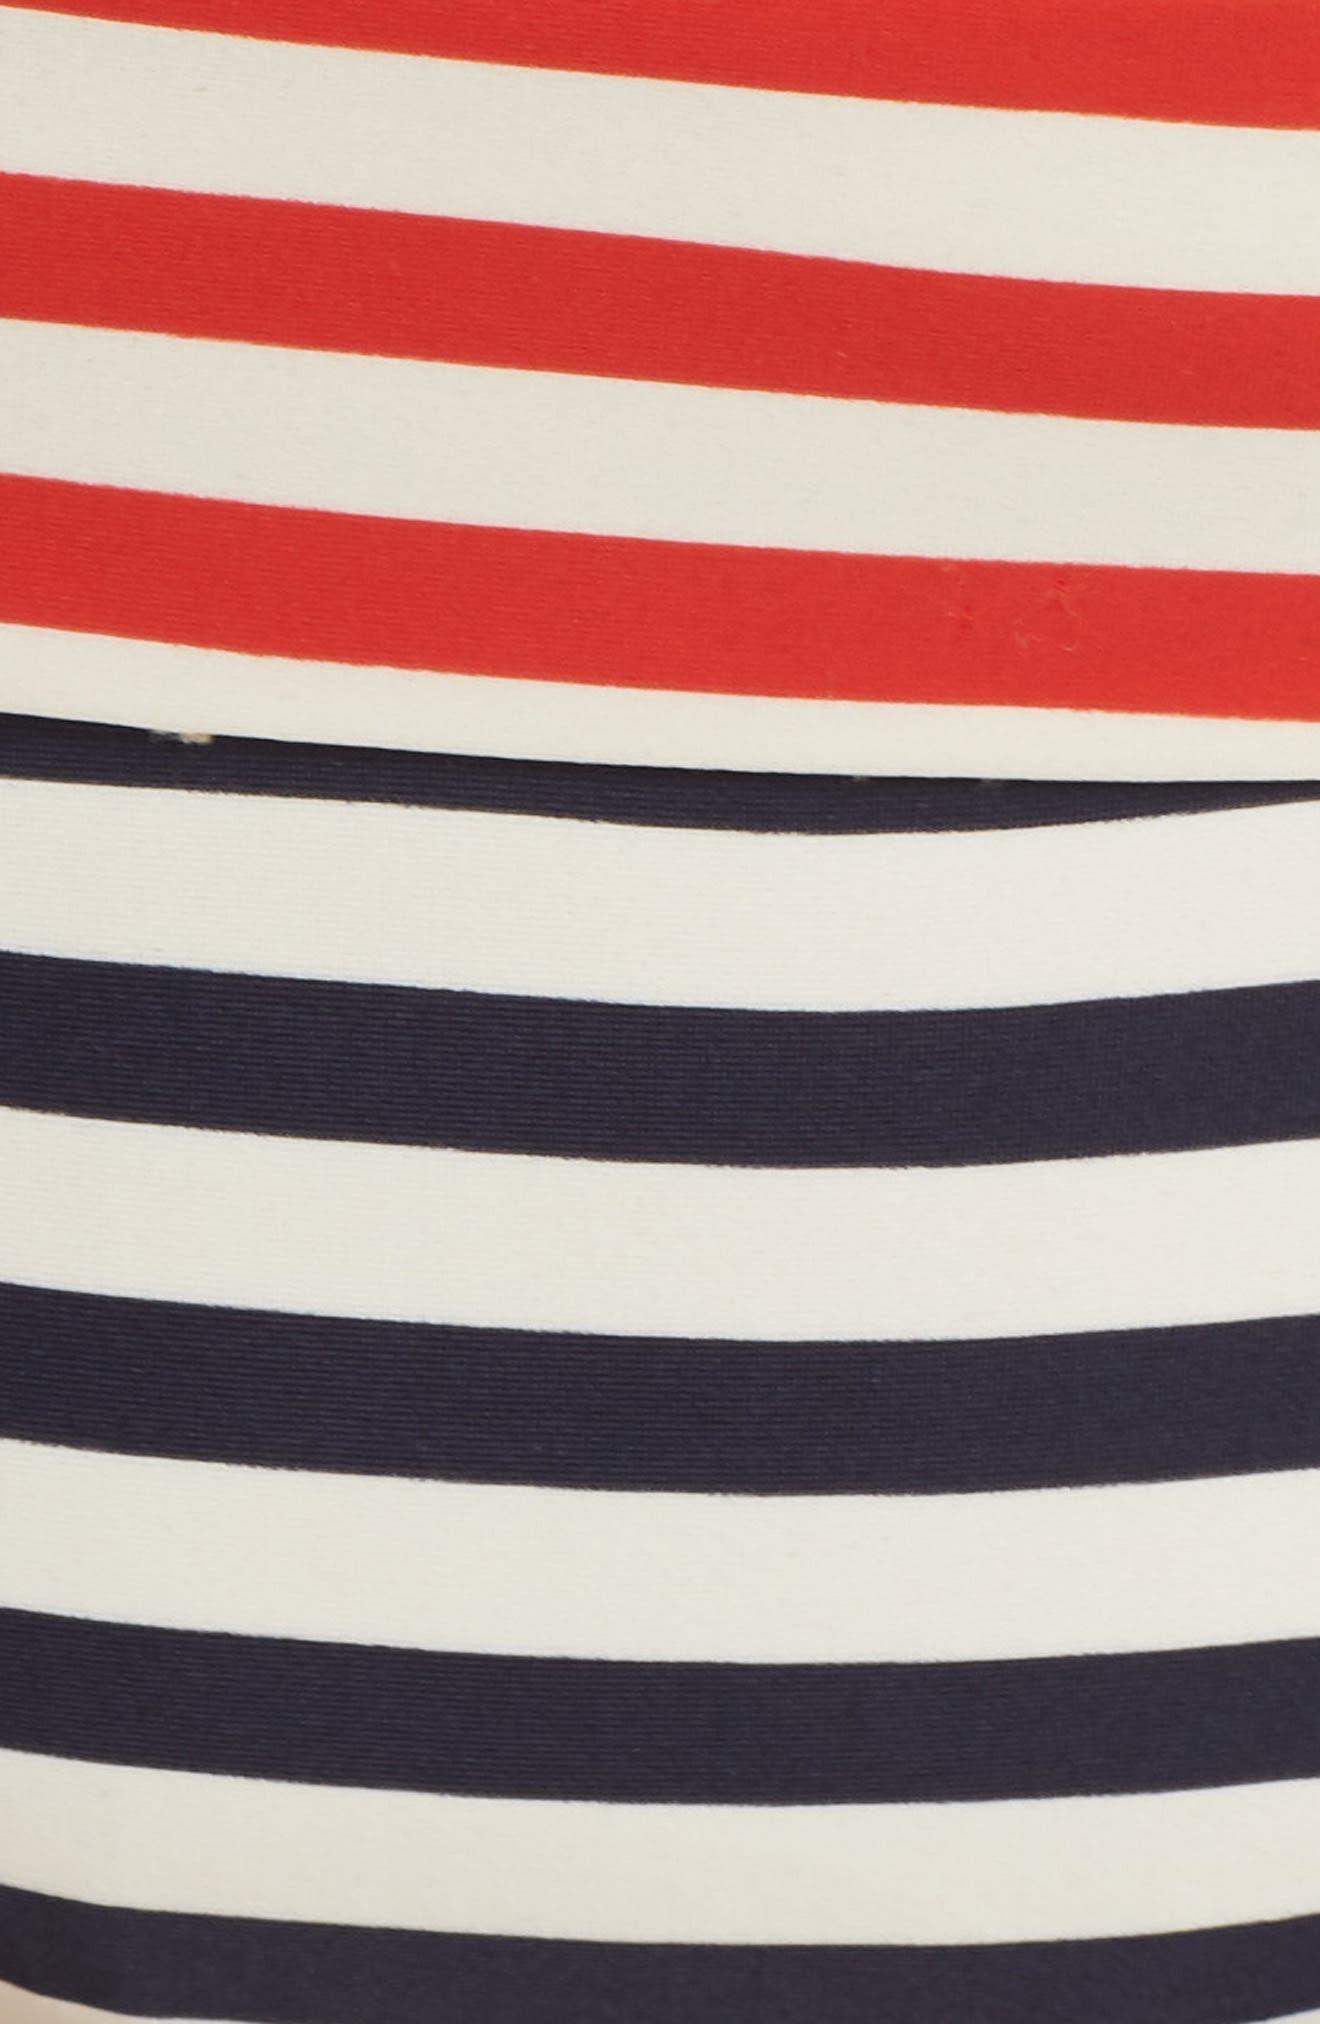 Stripe Banded Bikini Bottoms,                             Alternate thumbnail 5, color,                             NAVY VIVID FLAME